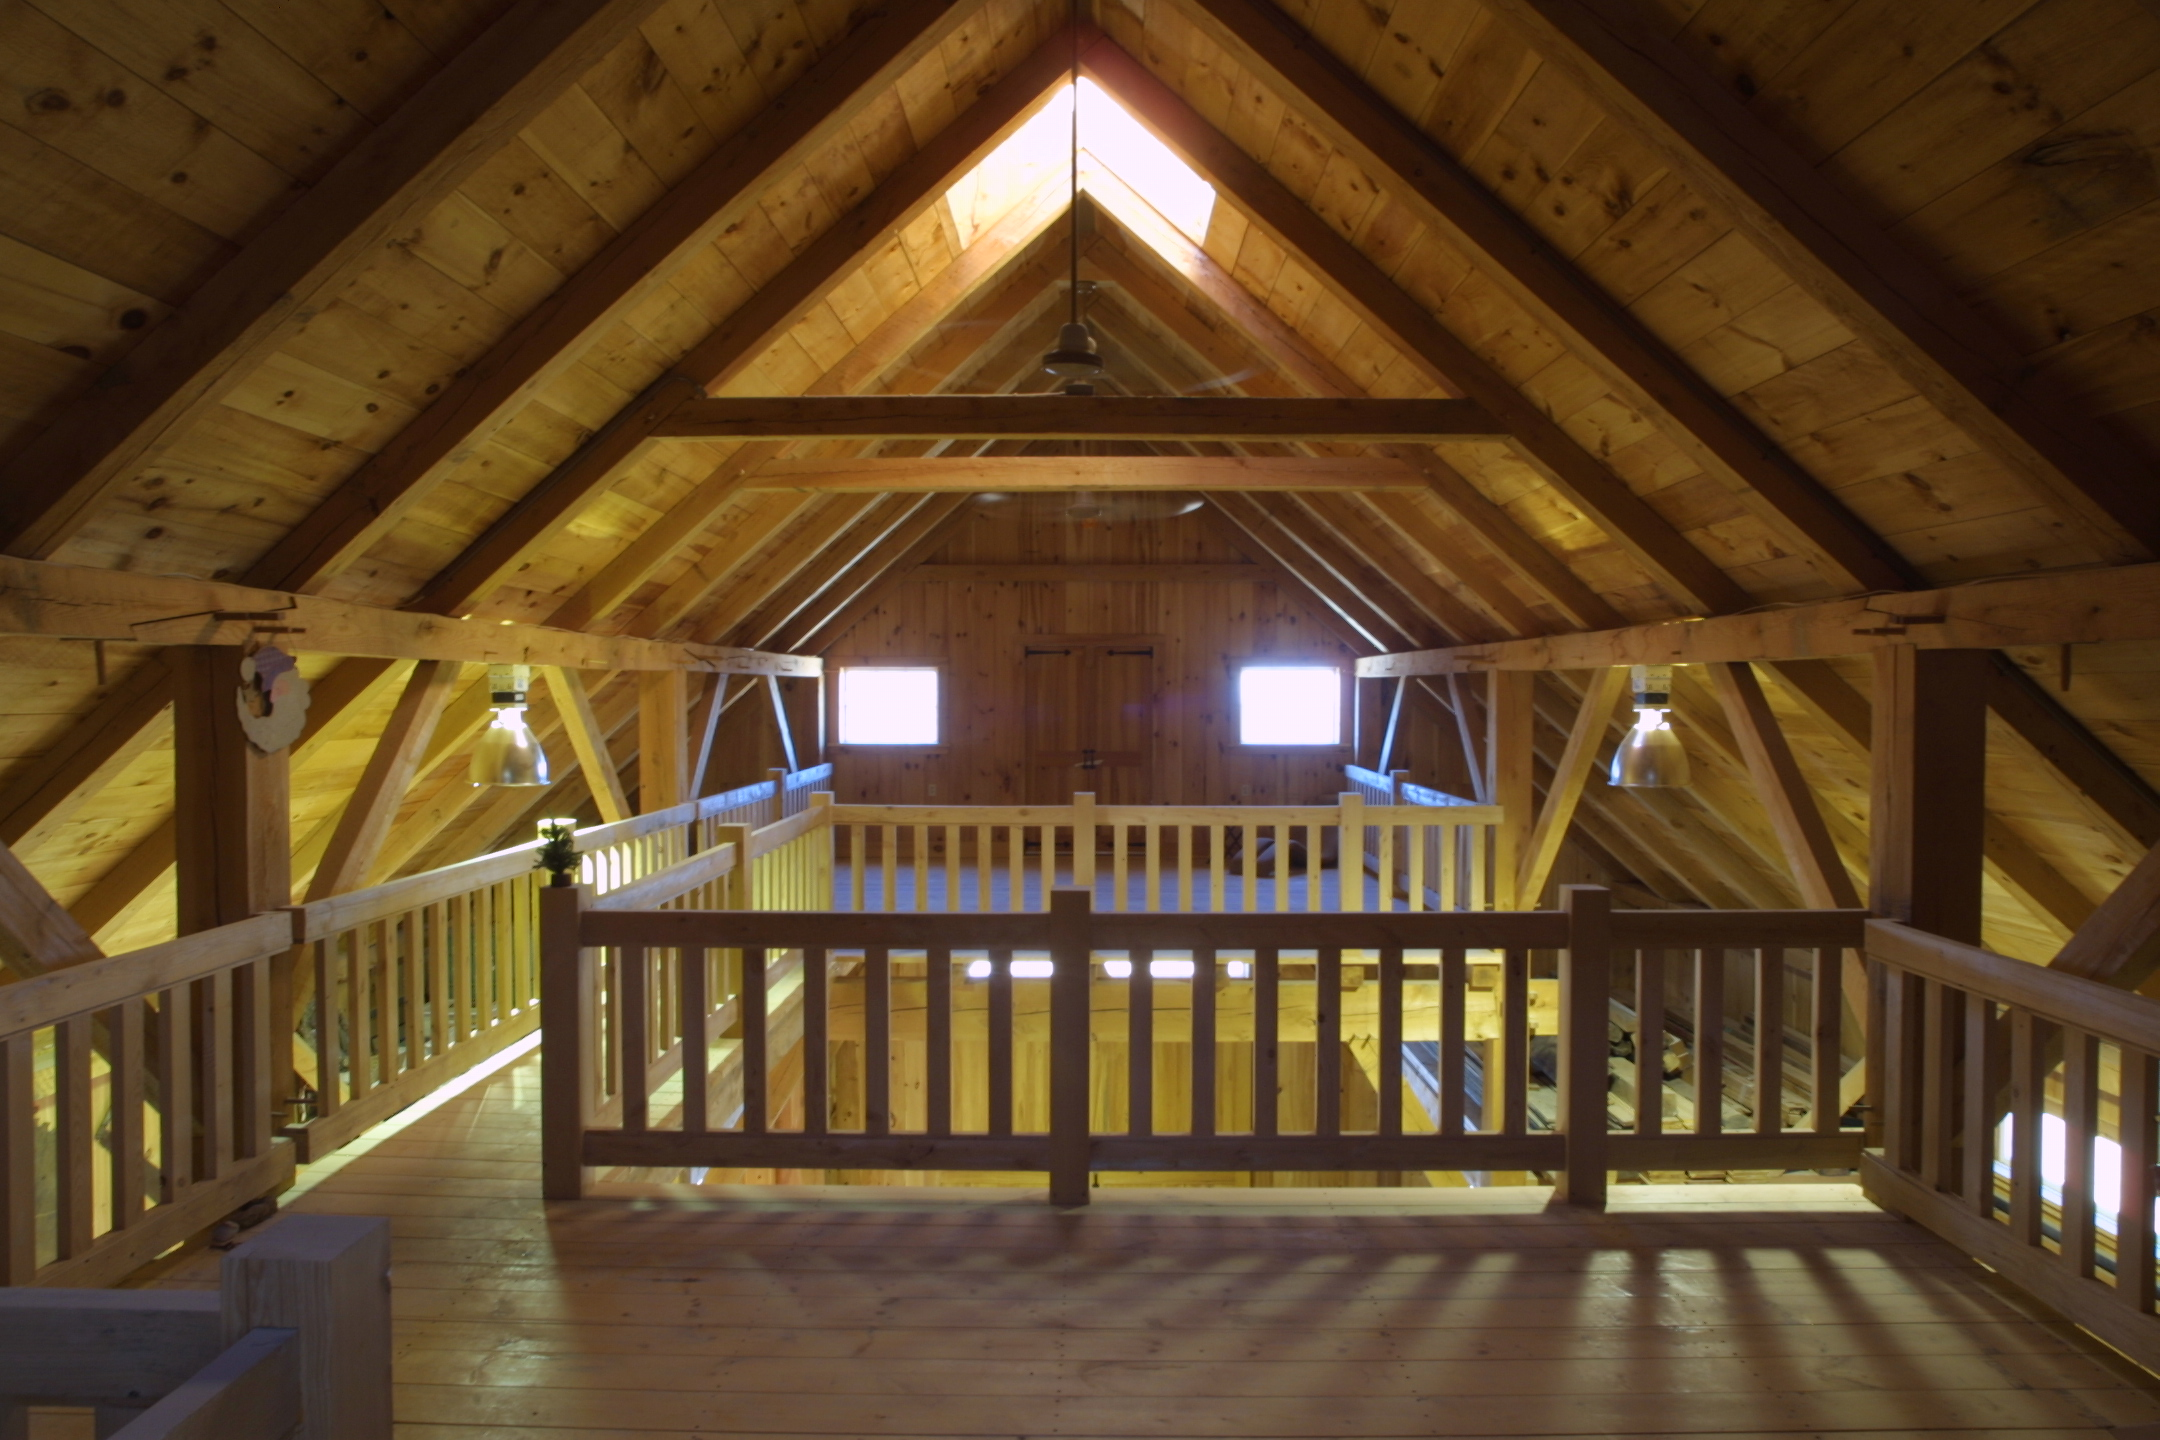 New England Barn Dutch Anchorbeam Barn